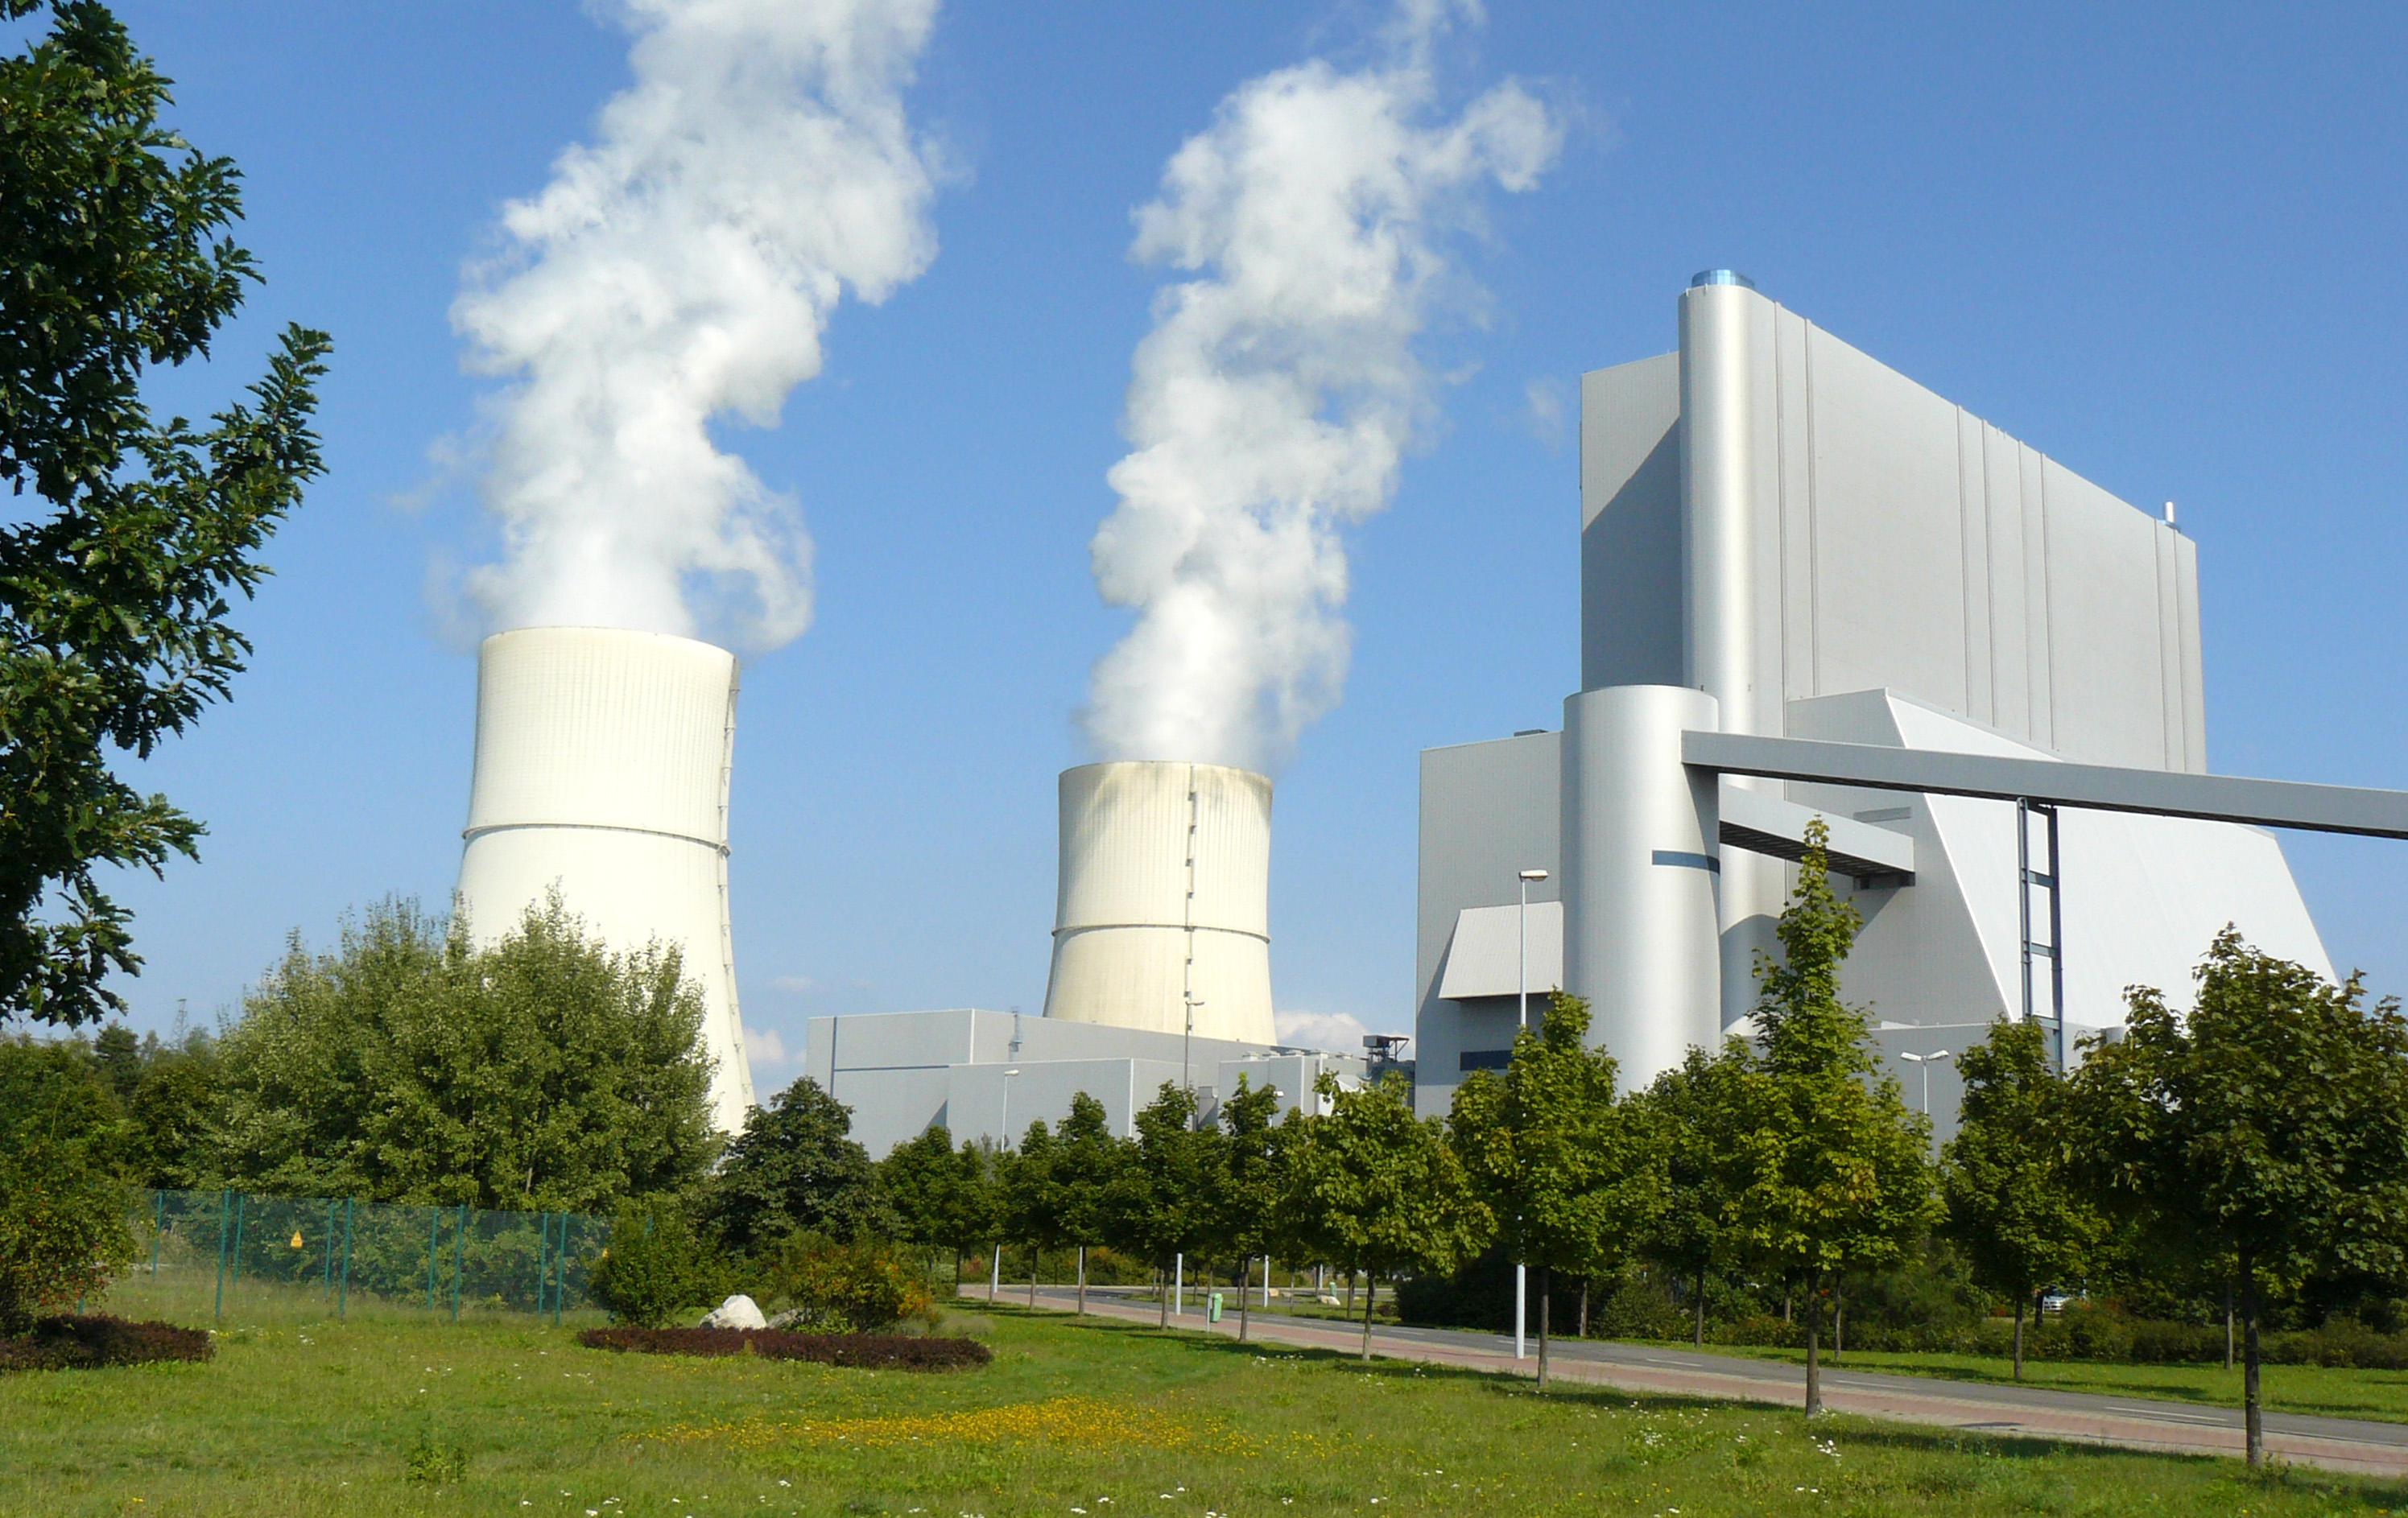 Germany Lusatia Plant Schwarze Pumpe